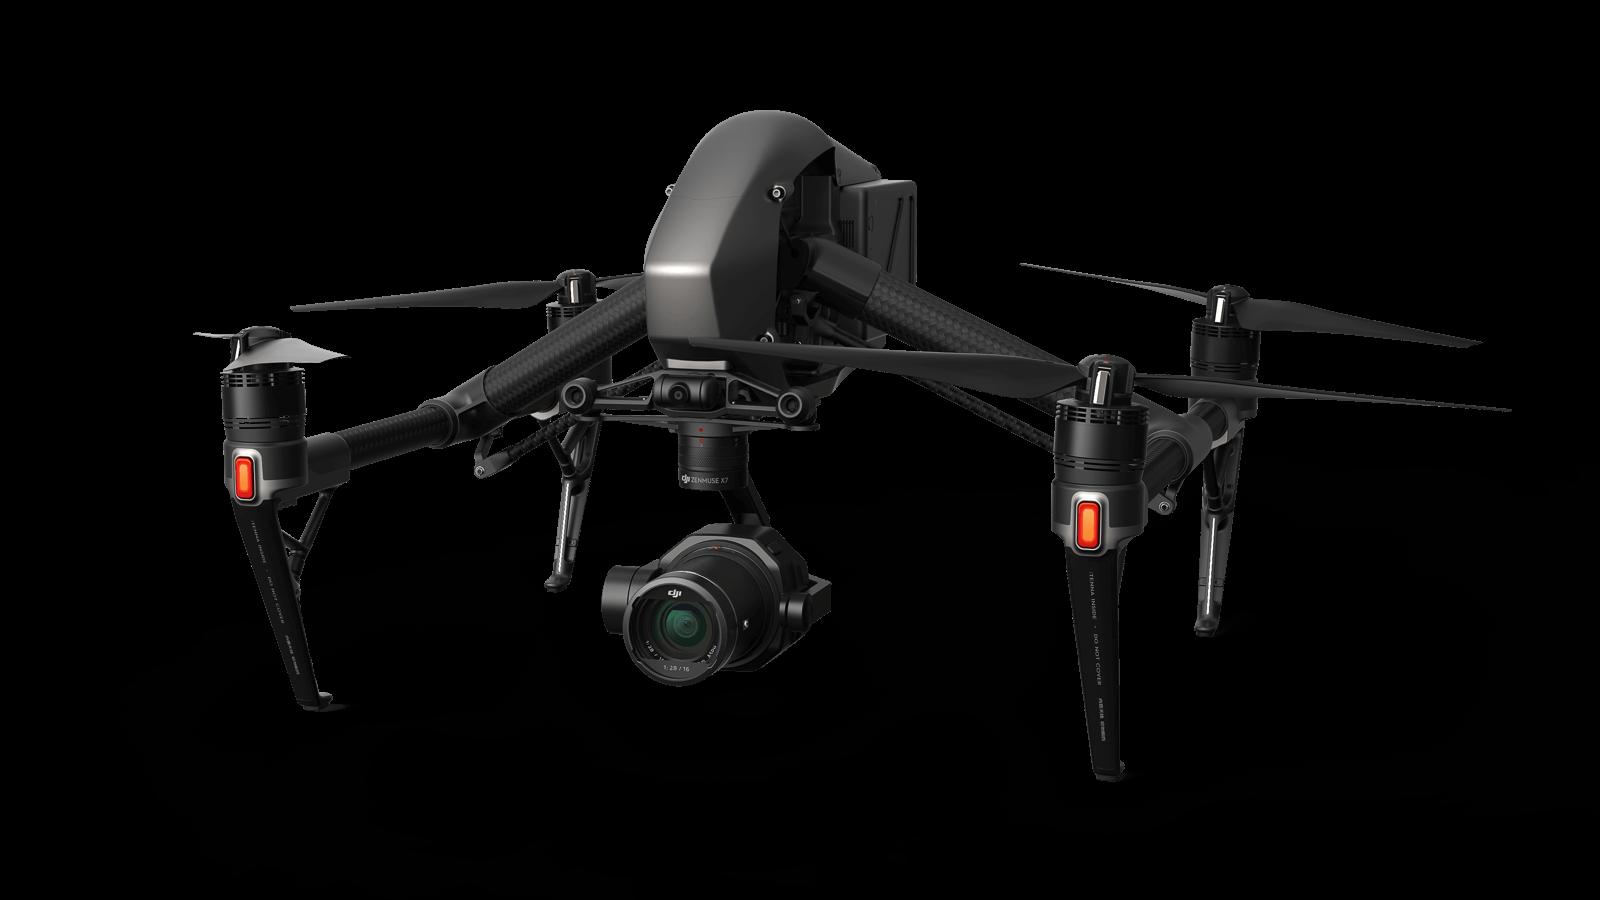 DJI Inspire 2 med Zenmuse X7 kamera